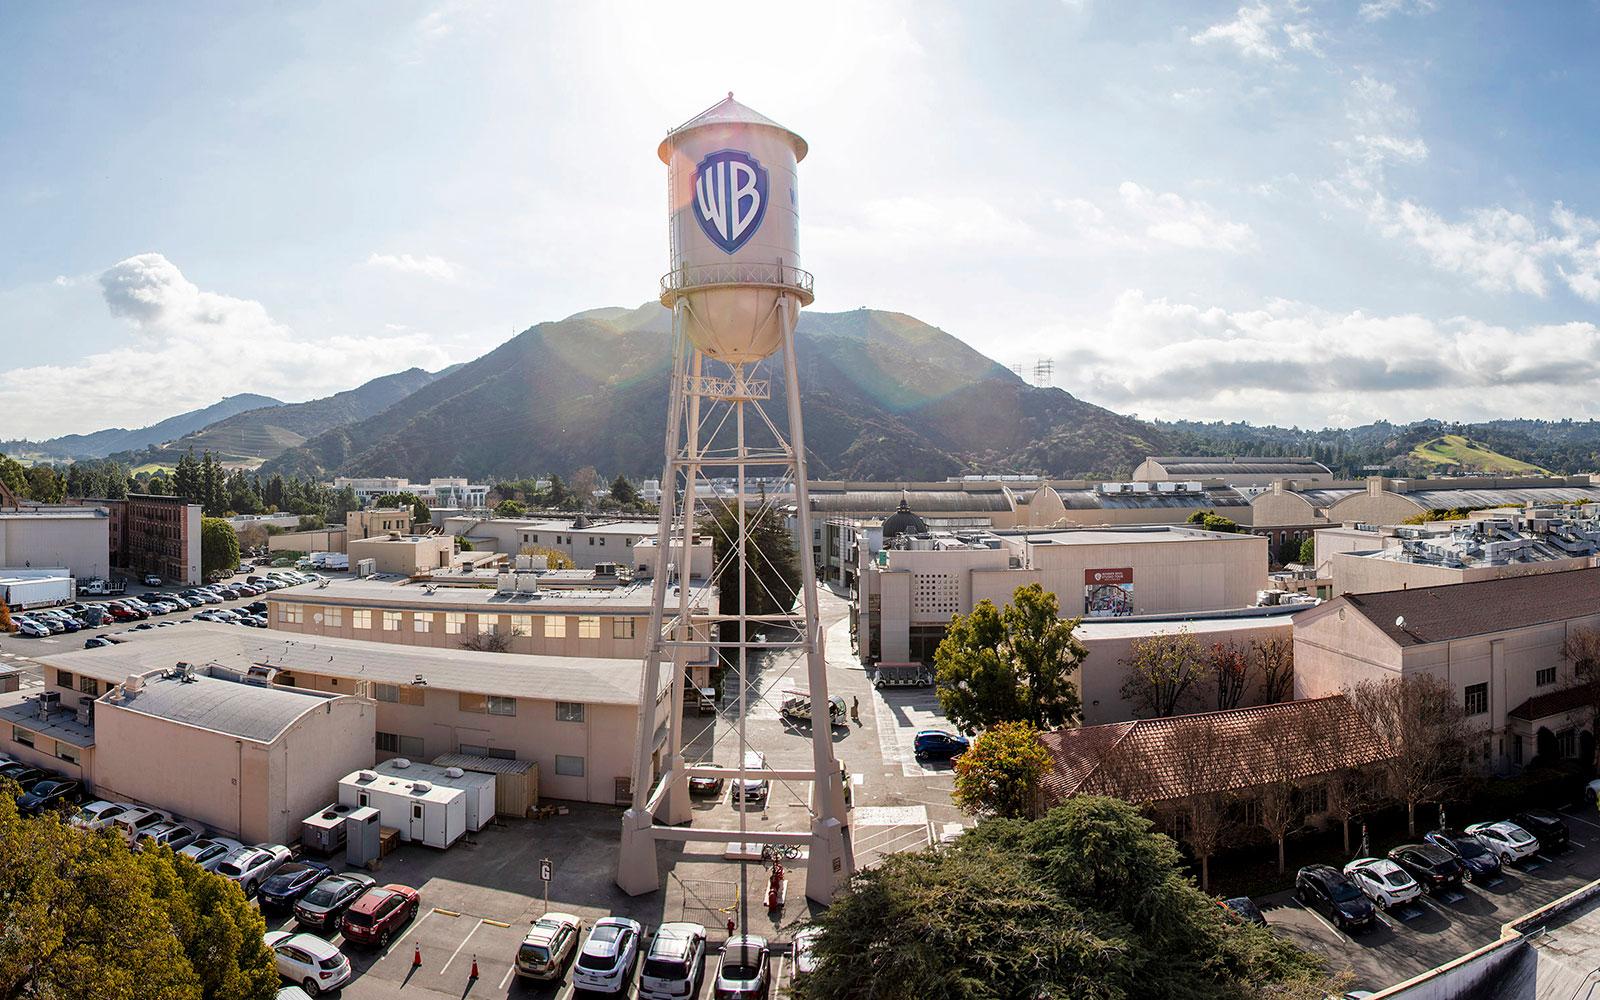 Warner Bros. Studio Tour Hollywood - Los Angeles, California - Official  Site Directions - Warner Bros. Studio Tour Hollywood - Los Angeles,  California - Official Site